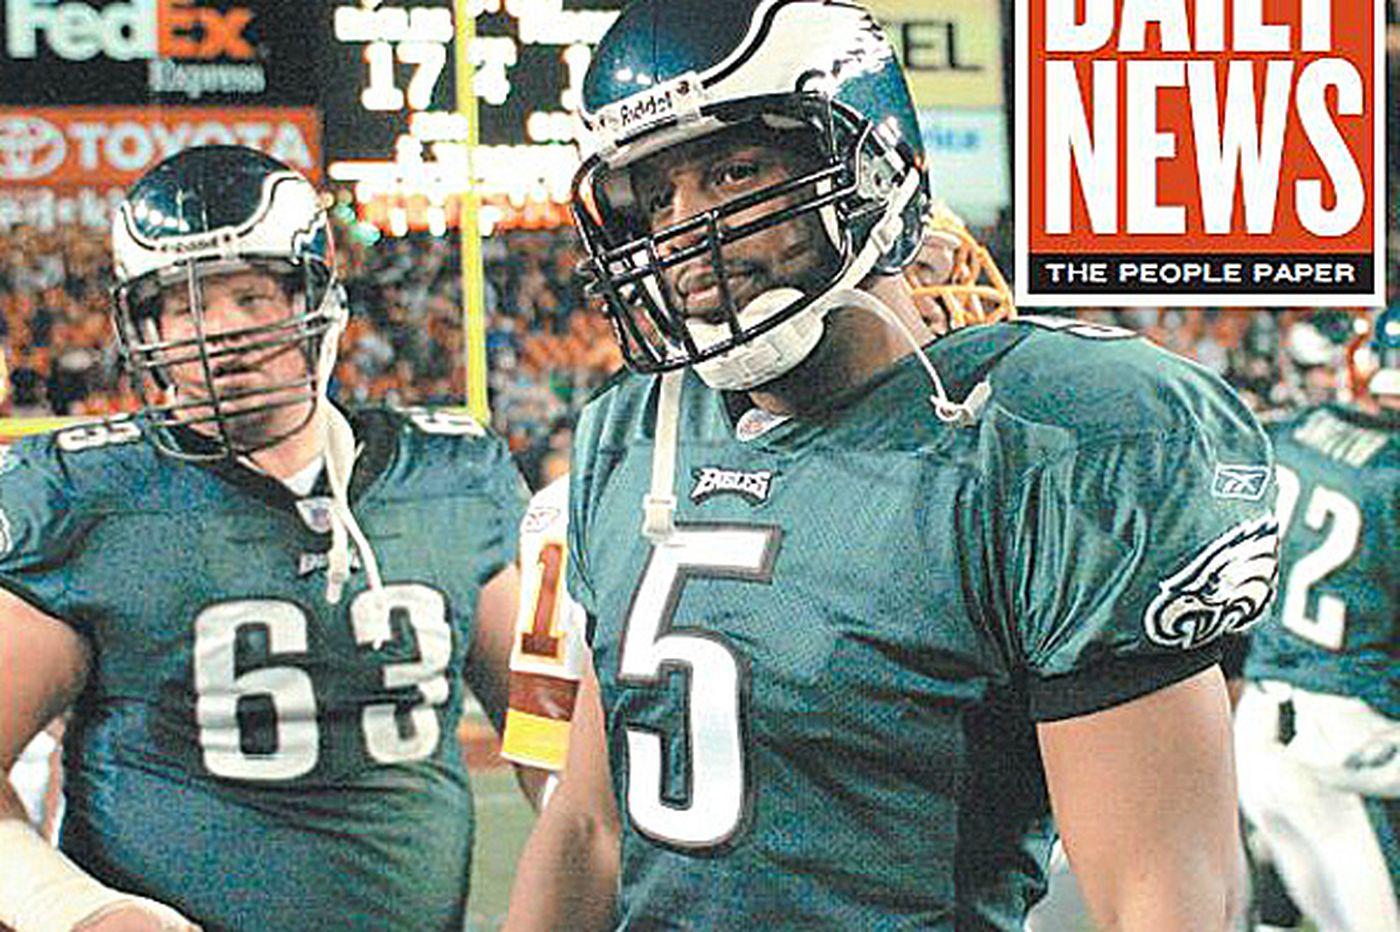 Eagles' 2004 season: Win over Redskins hurt so bad